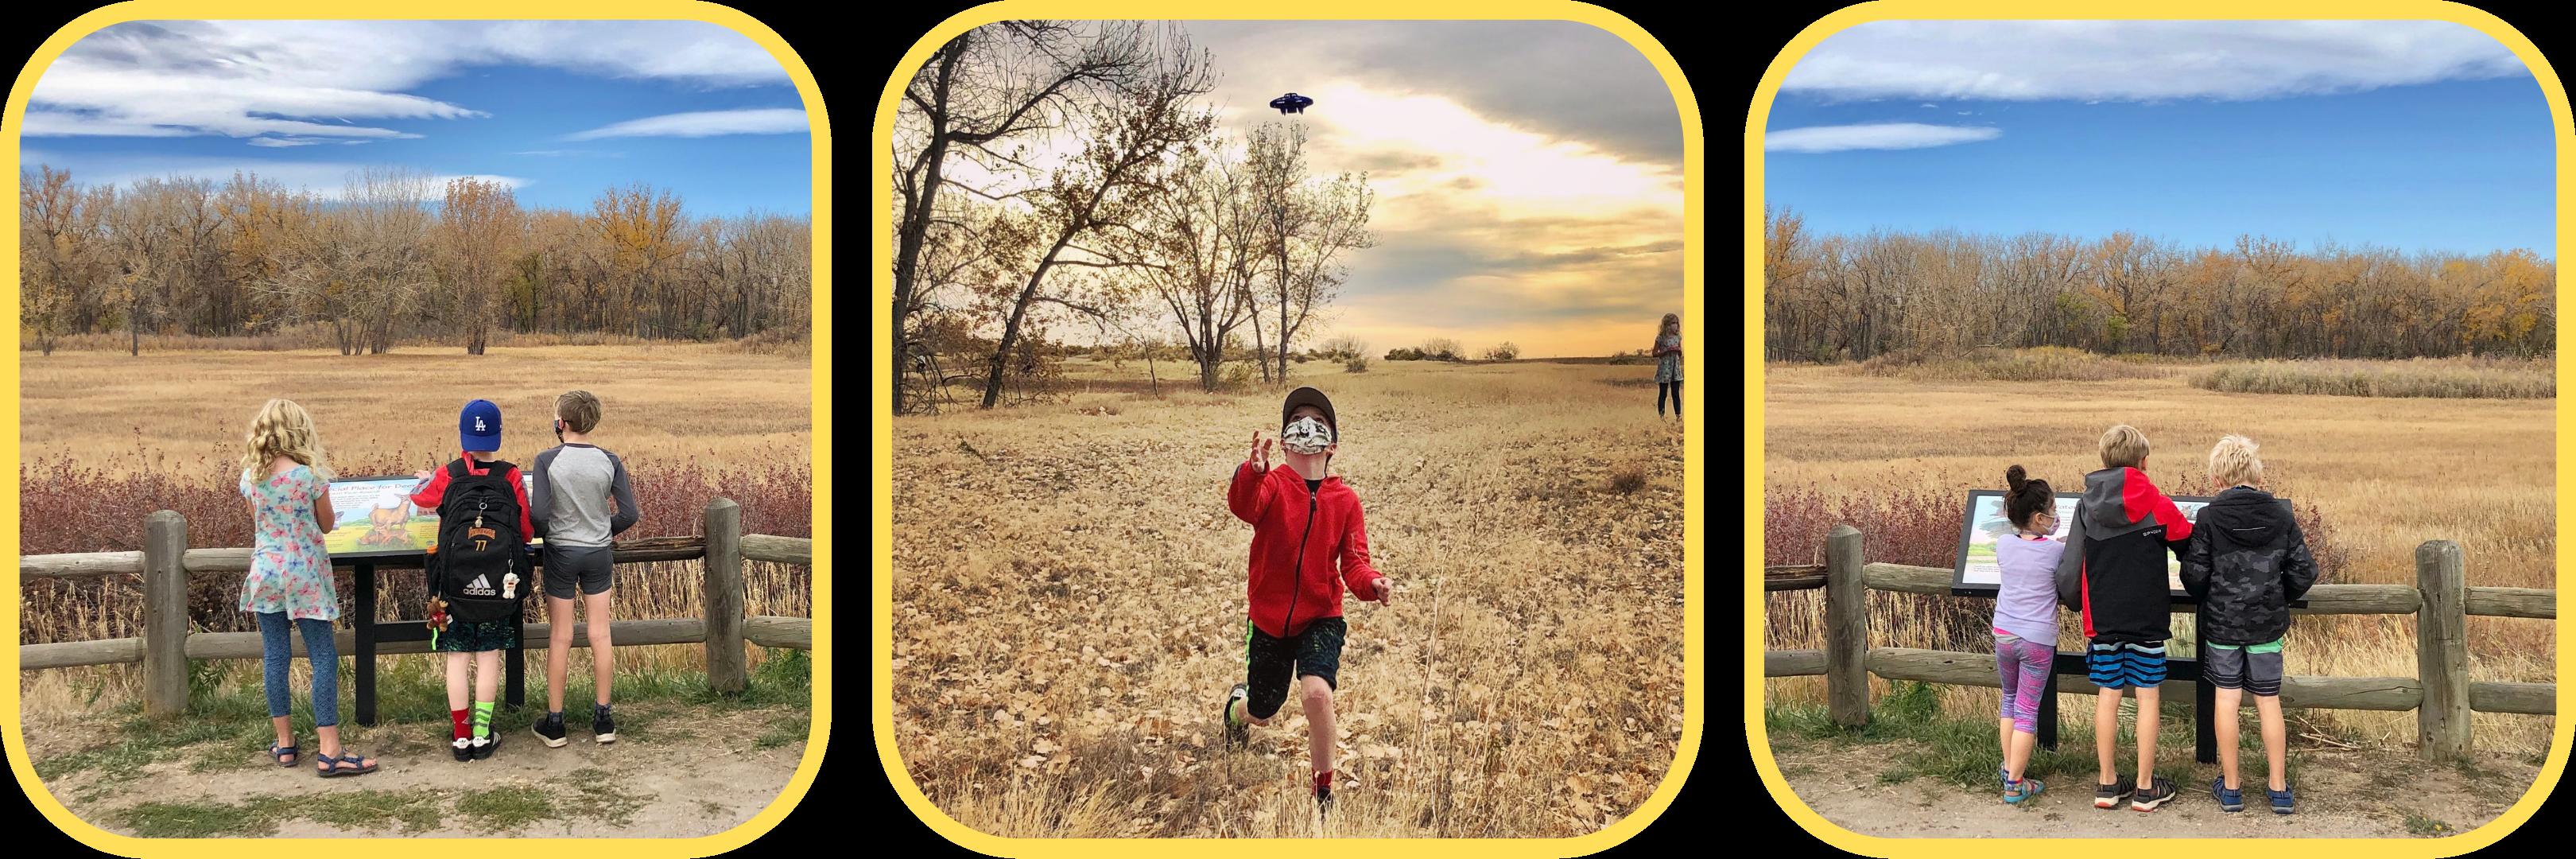 denver-tour-club-school-year-adventures-day-camp-kids-outdoor-adventures-2021.png